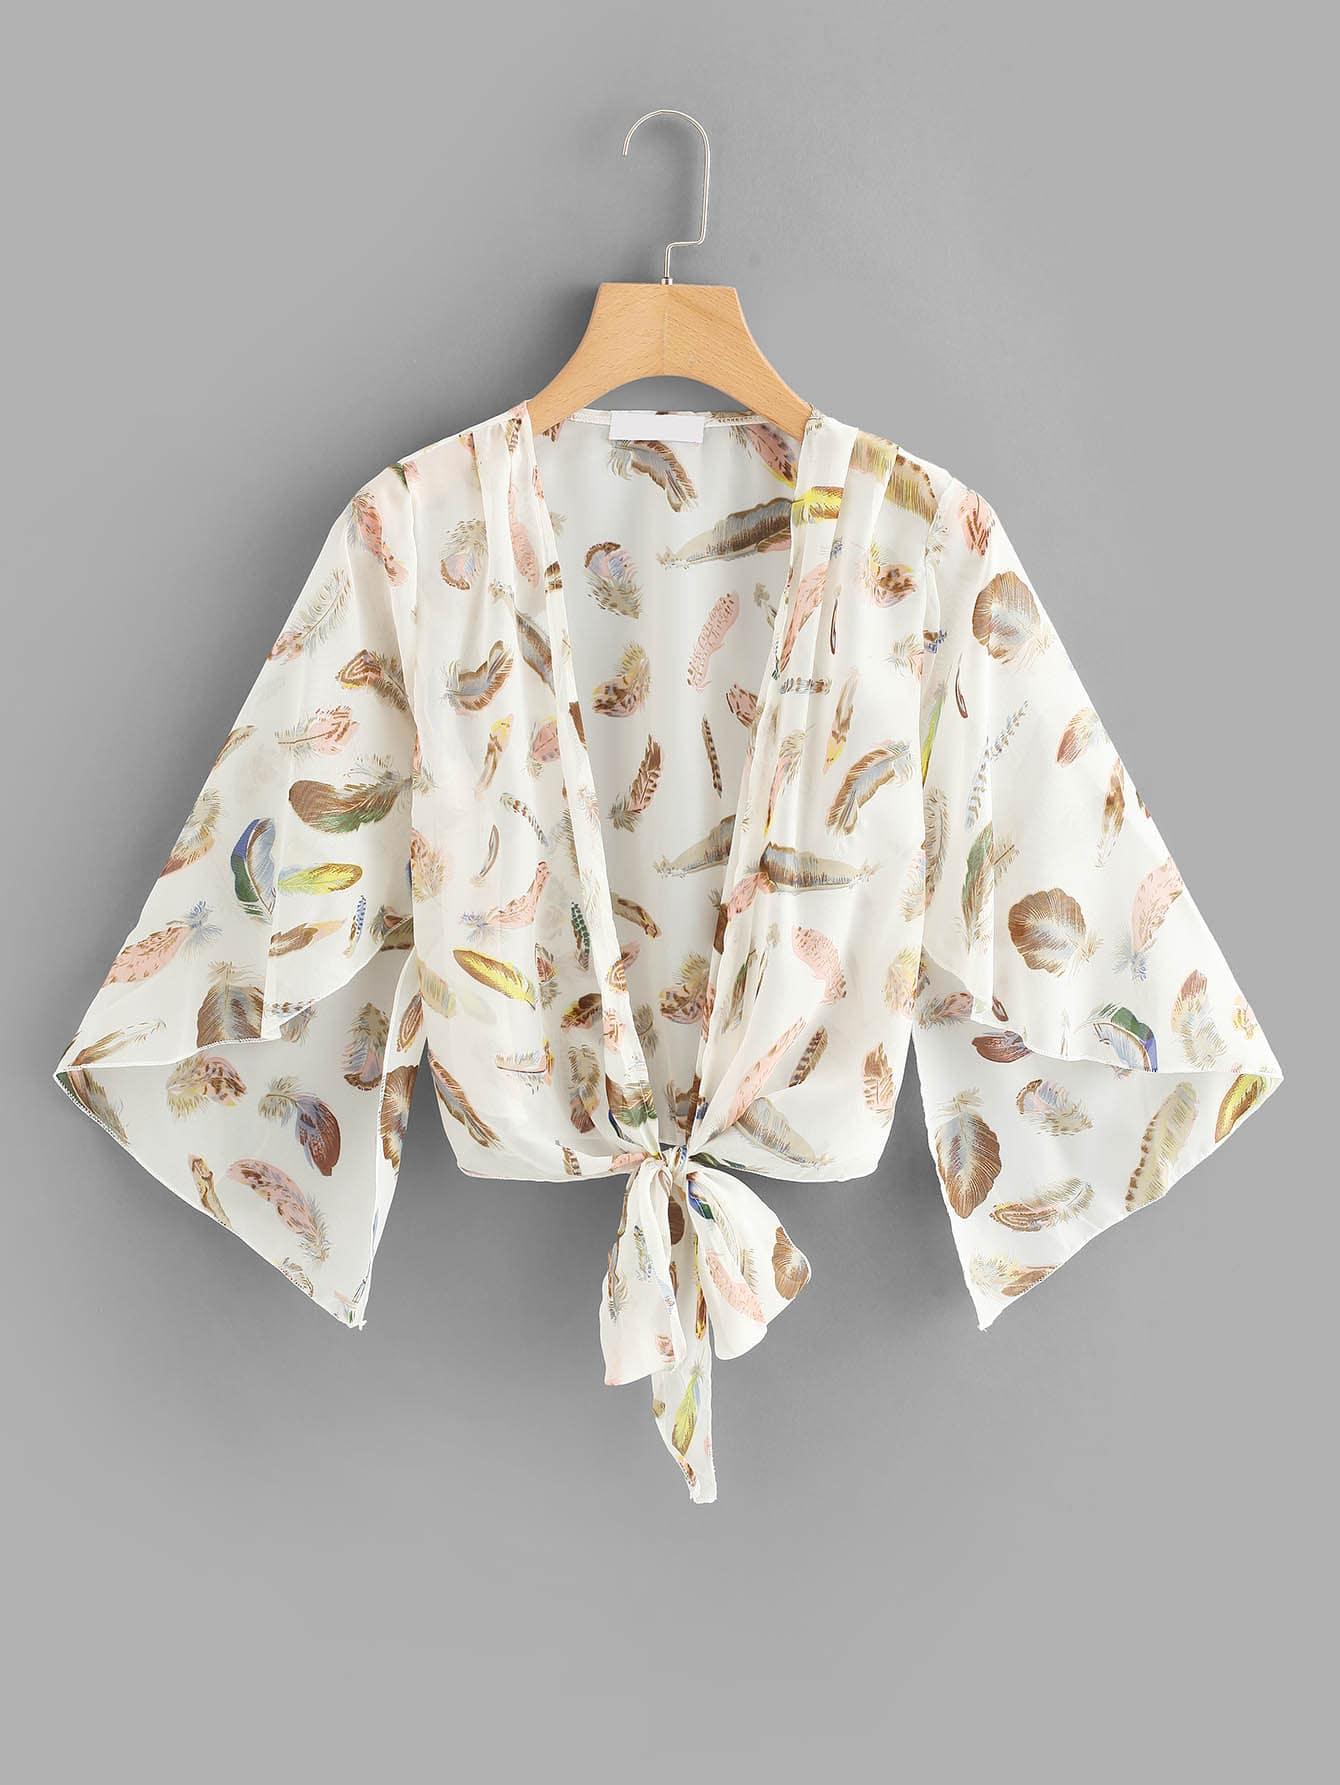 Feather Print Knot Hem Kimono knot hem star print kimono